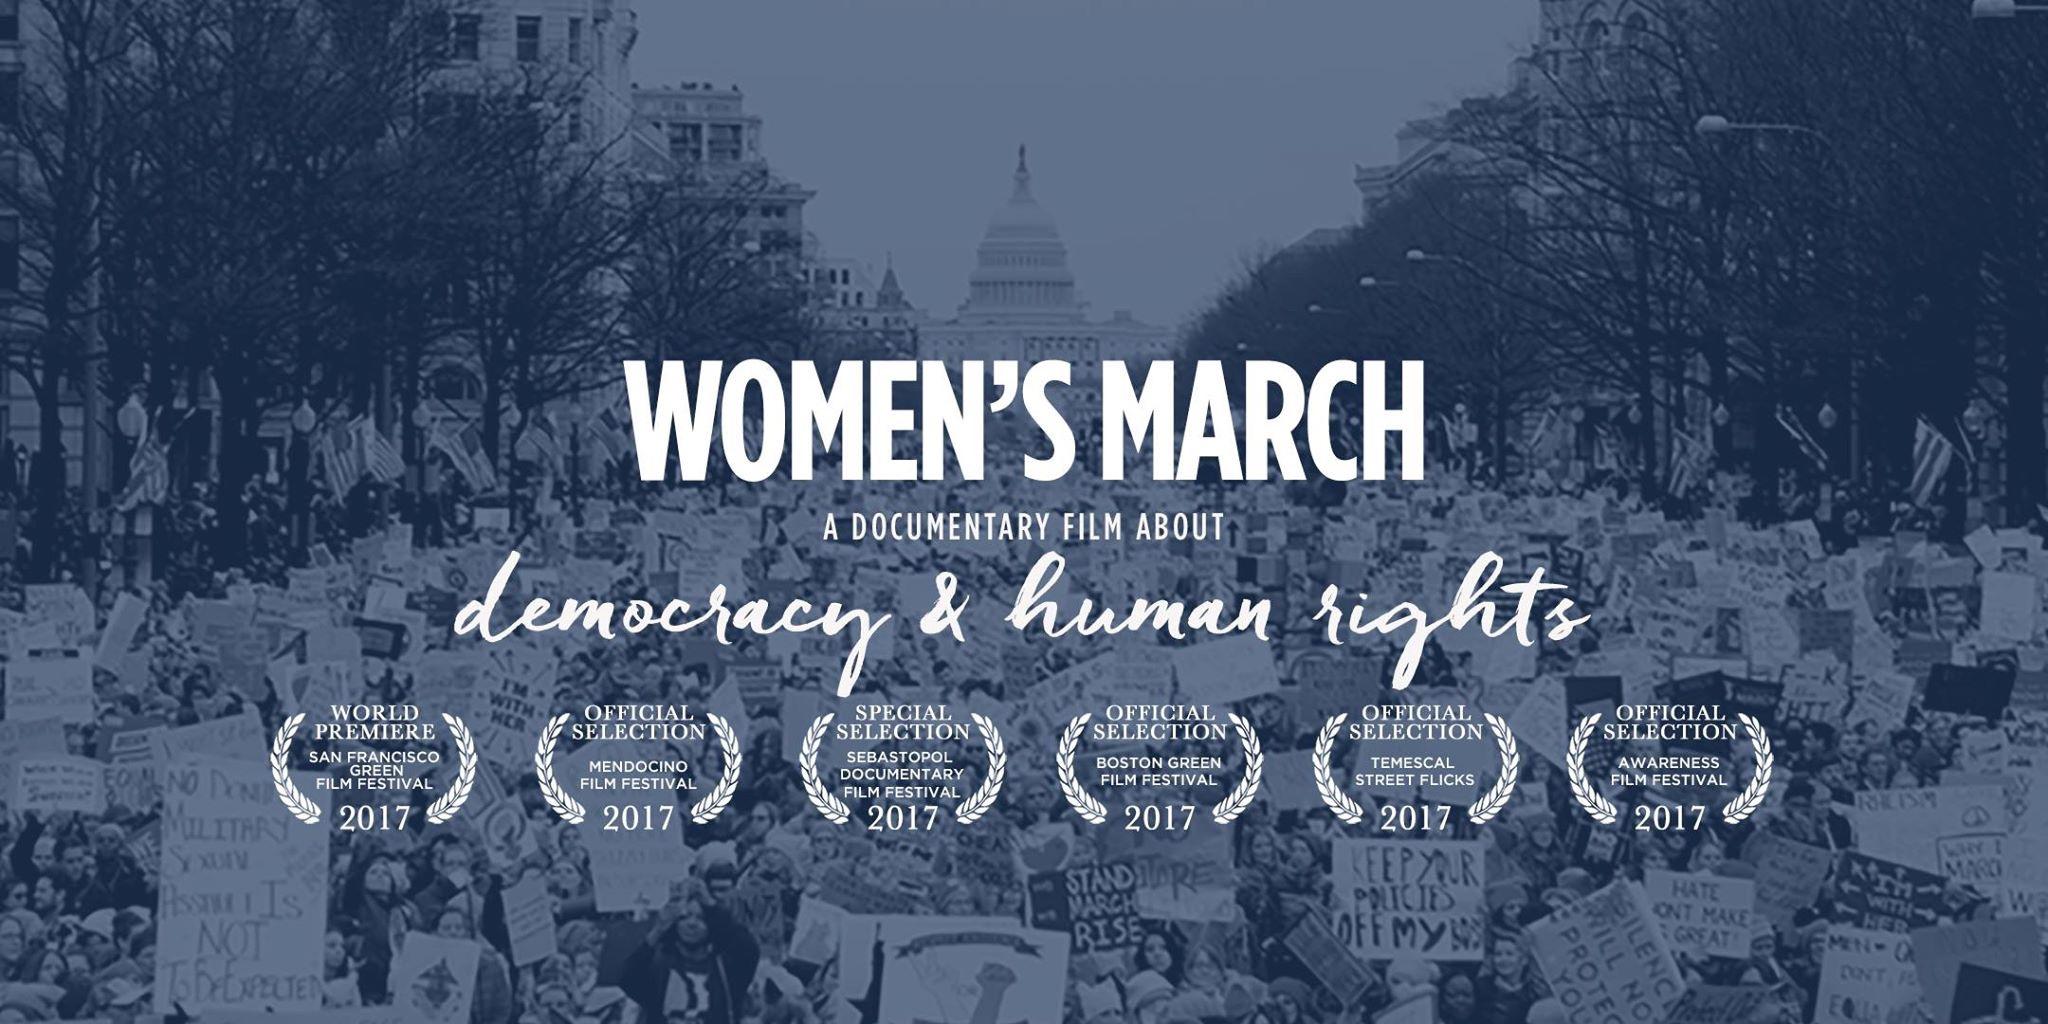 WomensMarch.jpeg